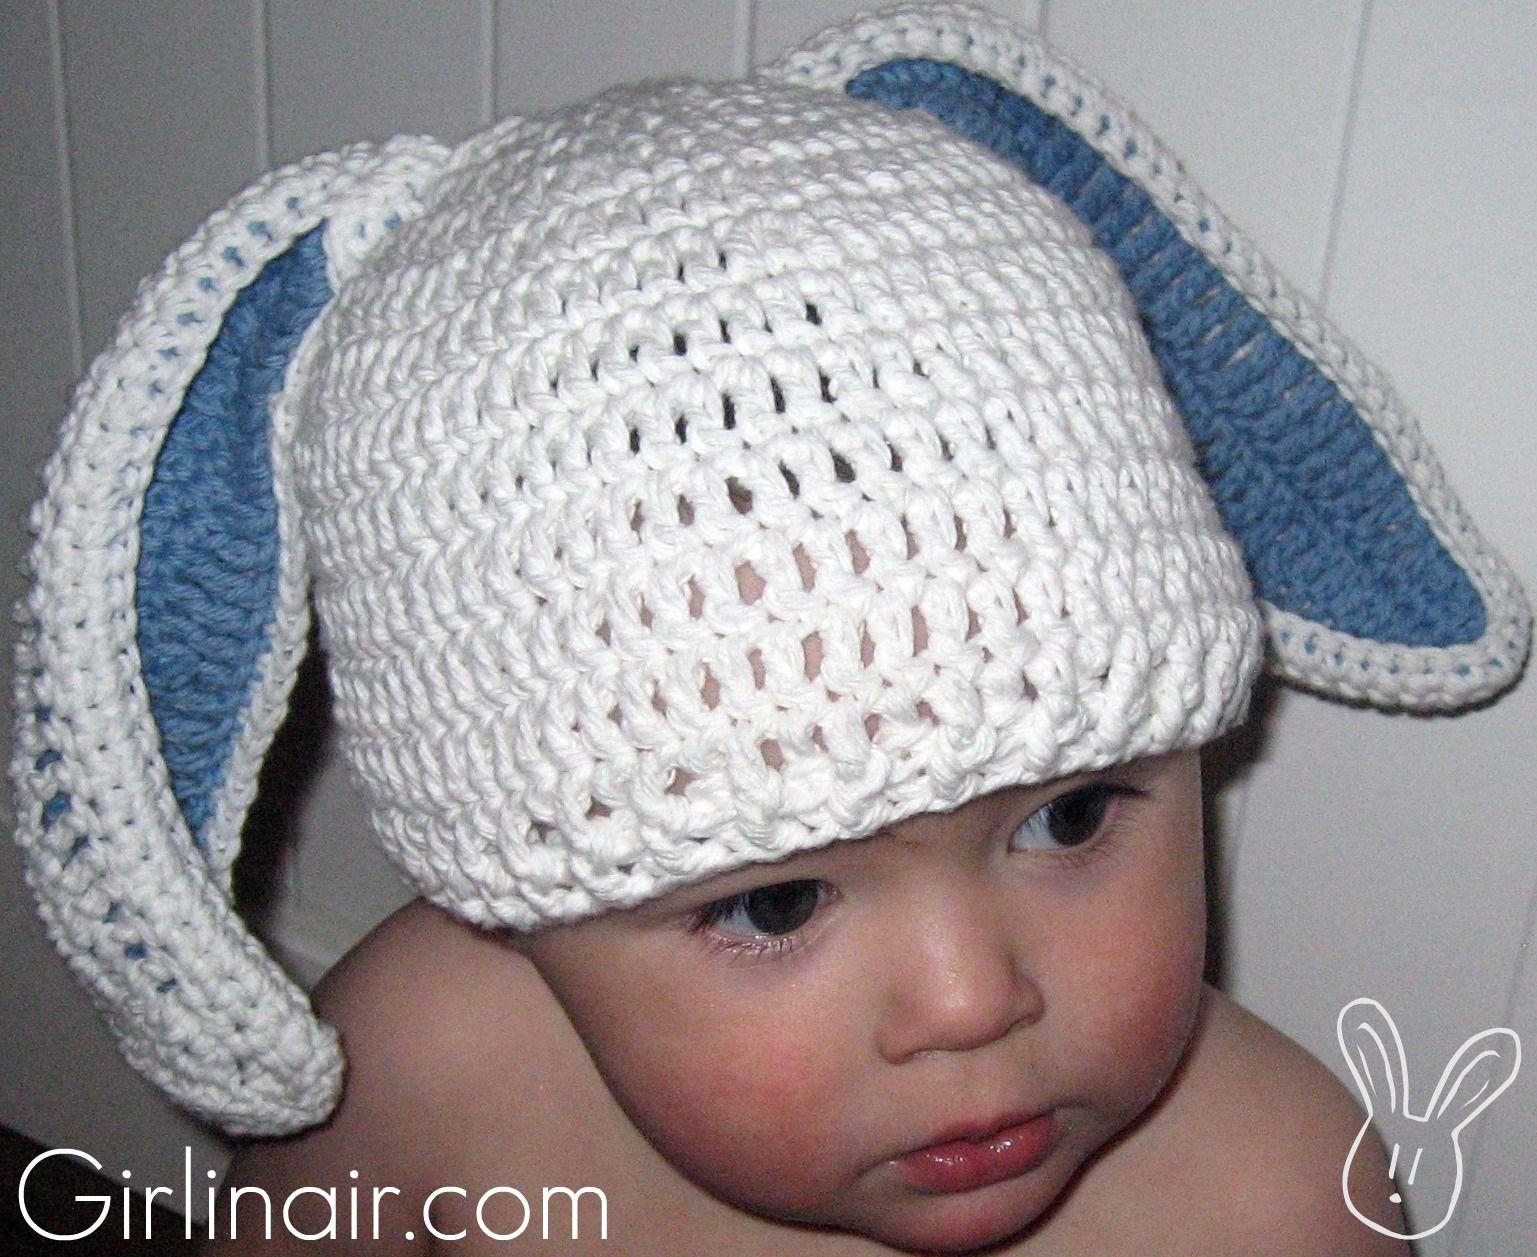 Crochet | Tools to enhance your creativity | GORROS BEBES Y NIÑOS ...